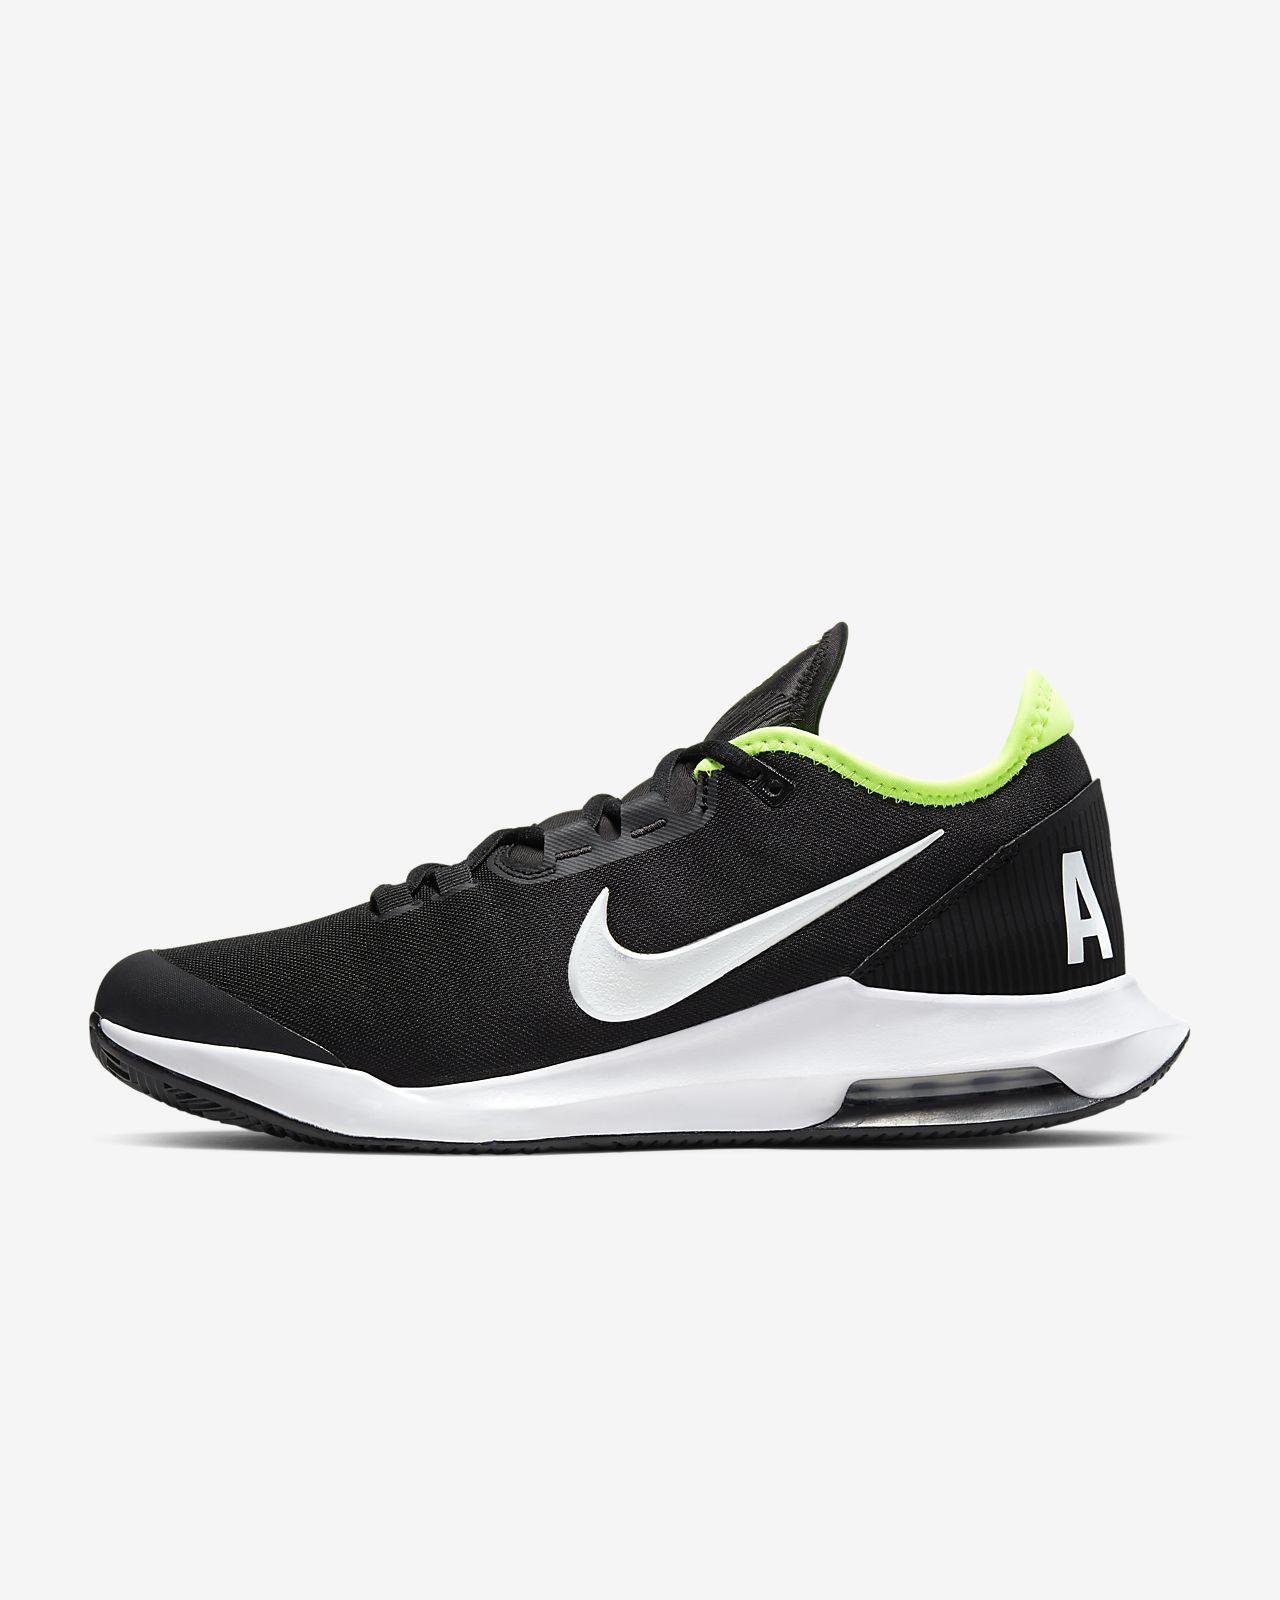 scarpe uomo da tennis nike